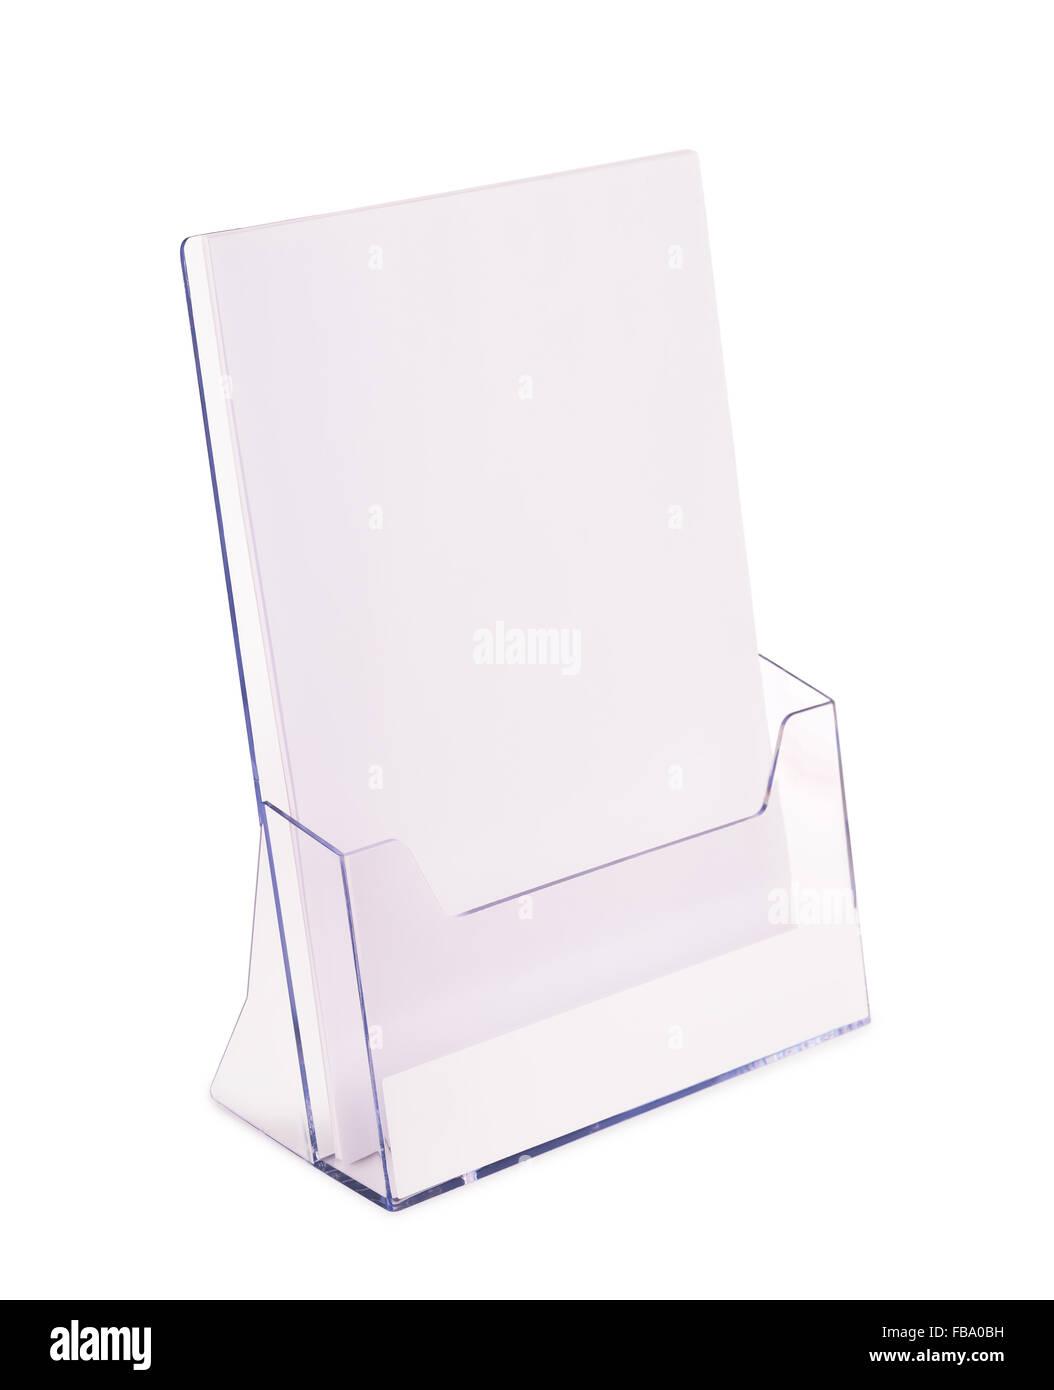 Porte brochures acrylique isolated on white Photo Stock